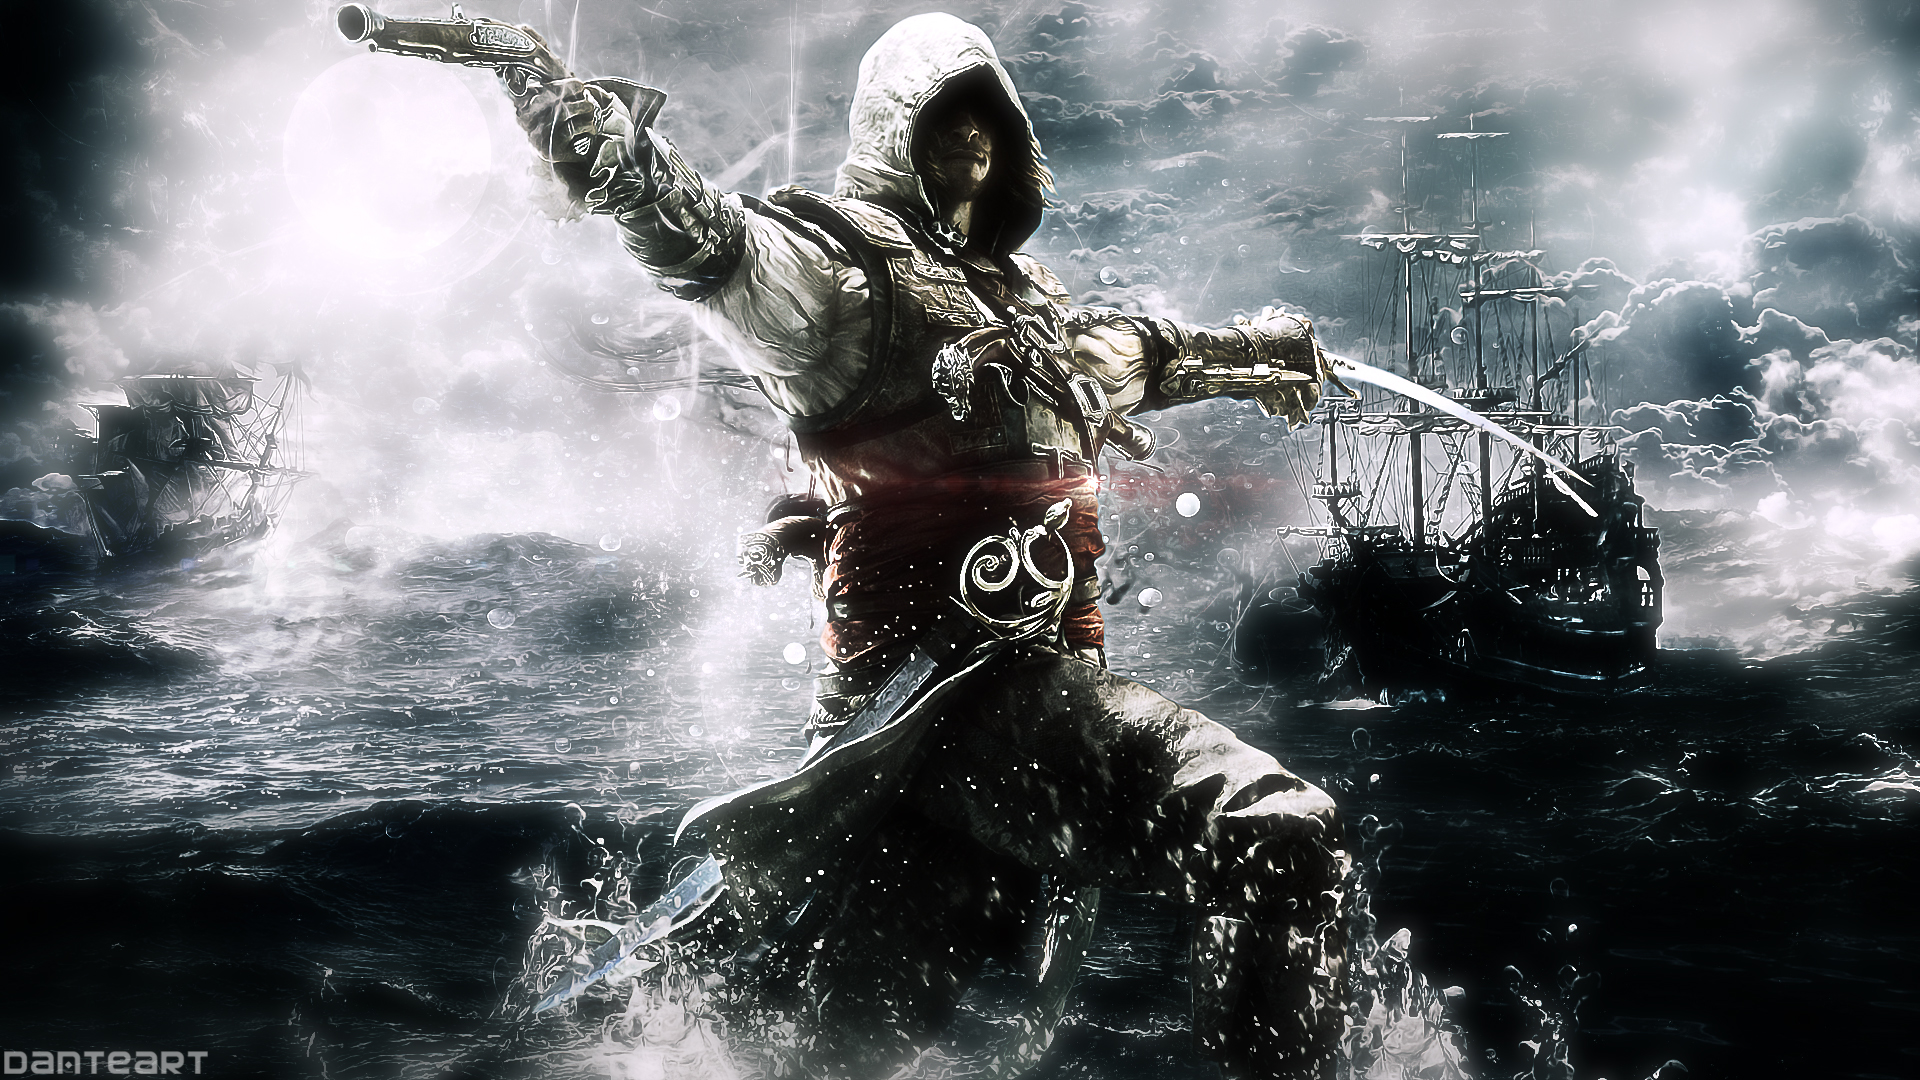 Assassin S Creed 4 Black Flag Wallpaper By Danteartwallpapers On